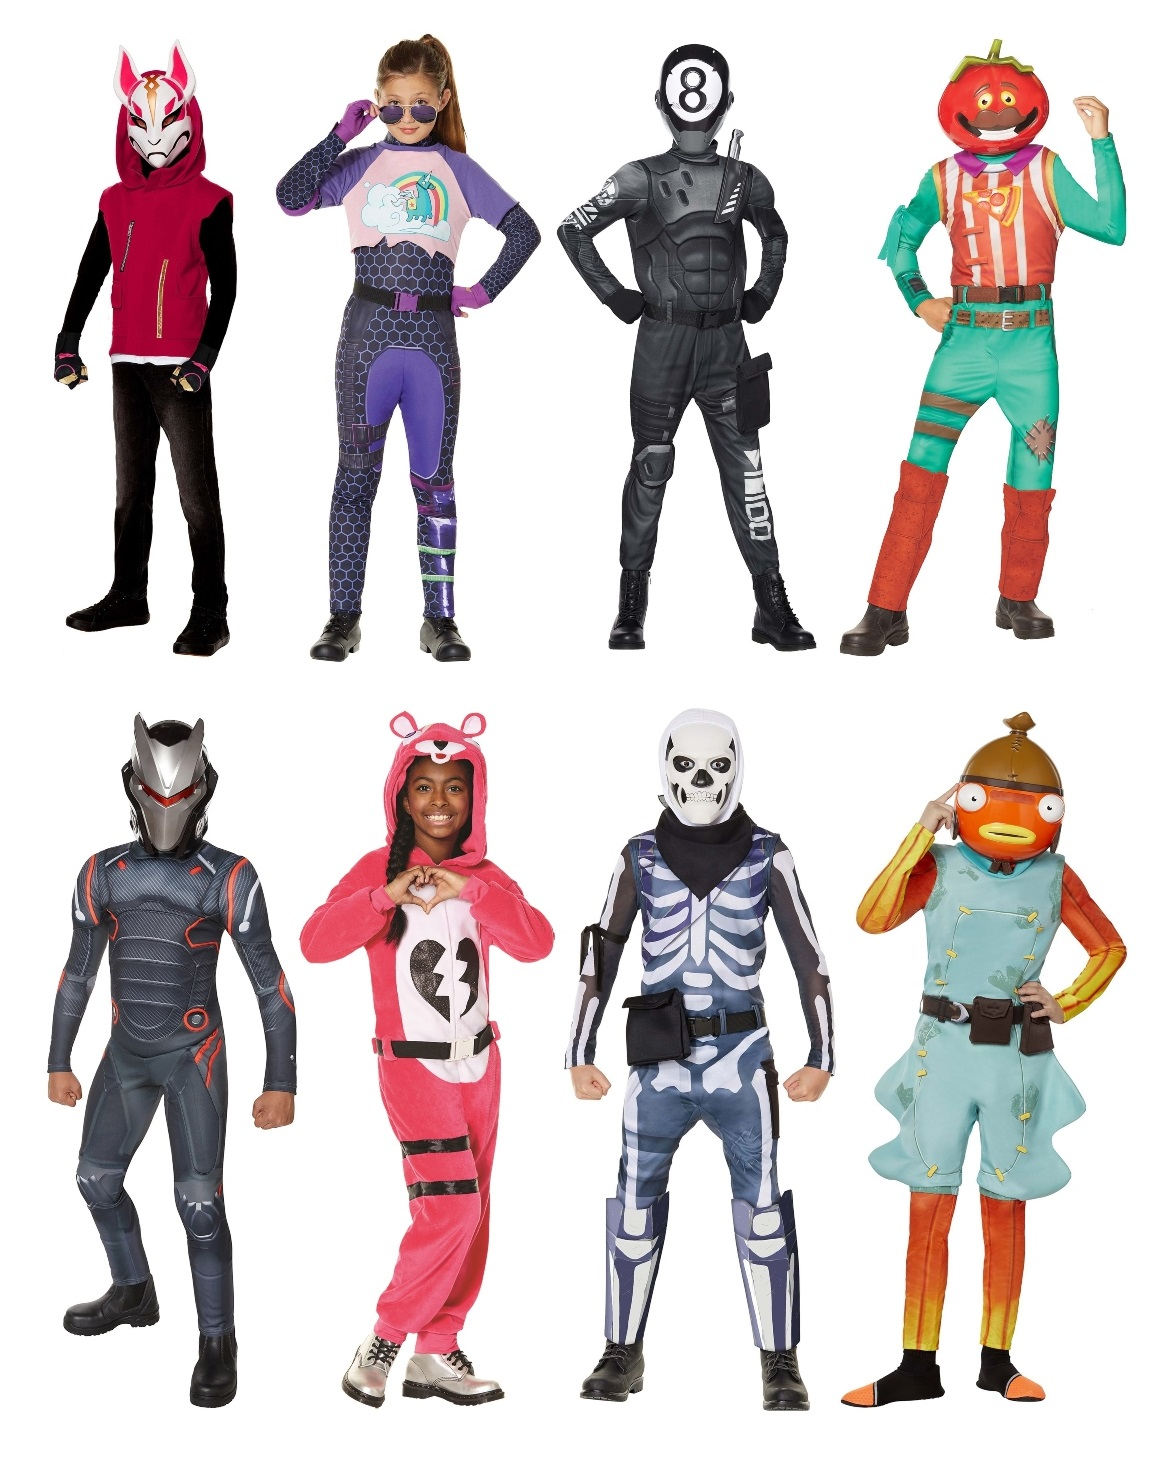 Fortnite Group Halloween Costumes